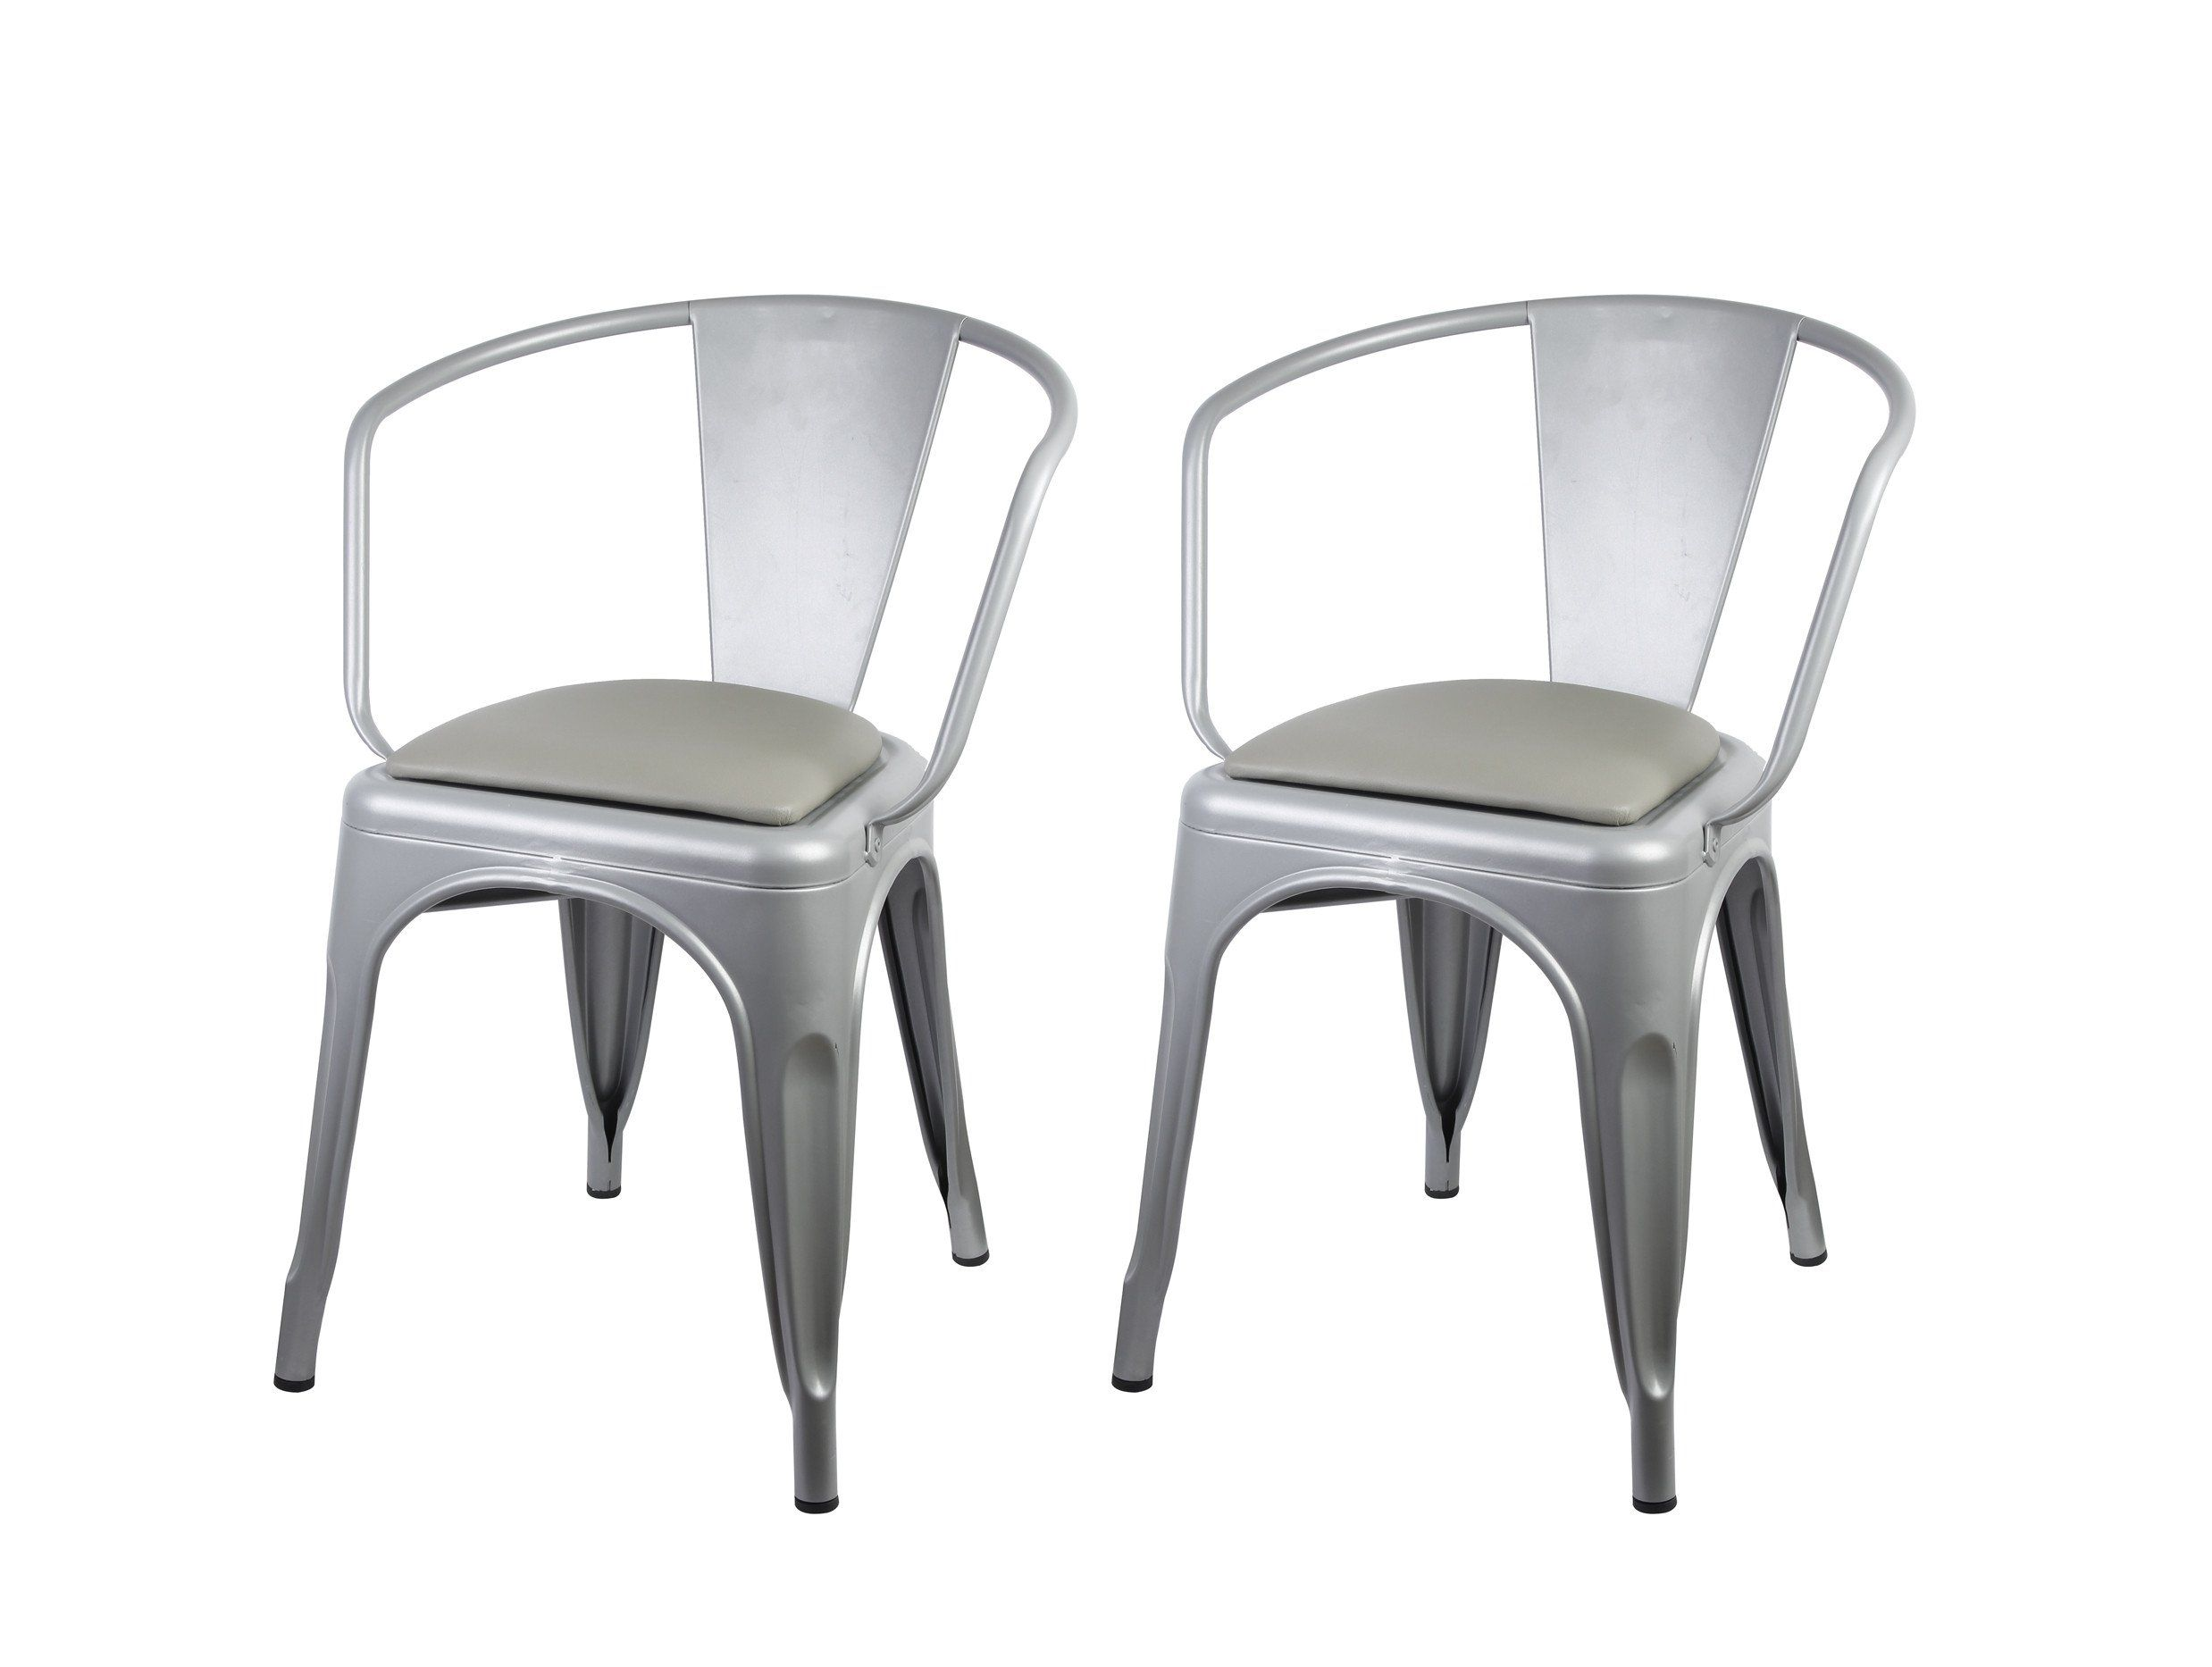 chairs replica place gunmetal next chair metallica xavier pauchard outdoor color tolix previous furniture shop